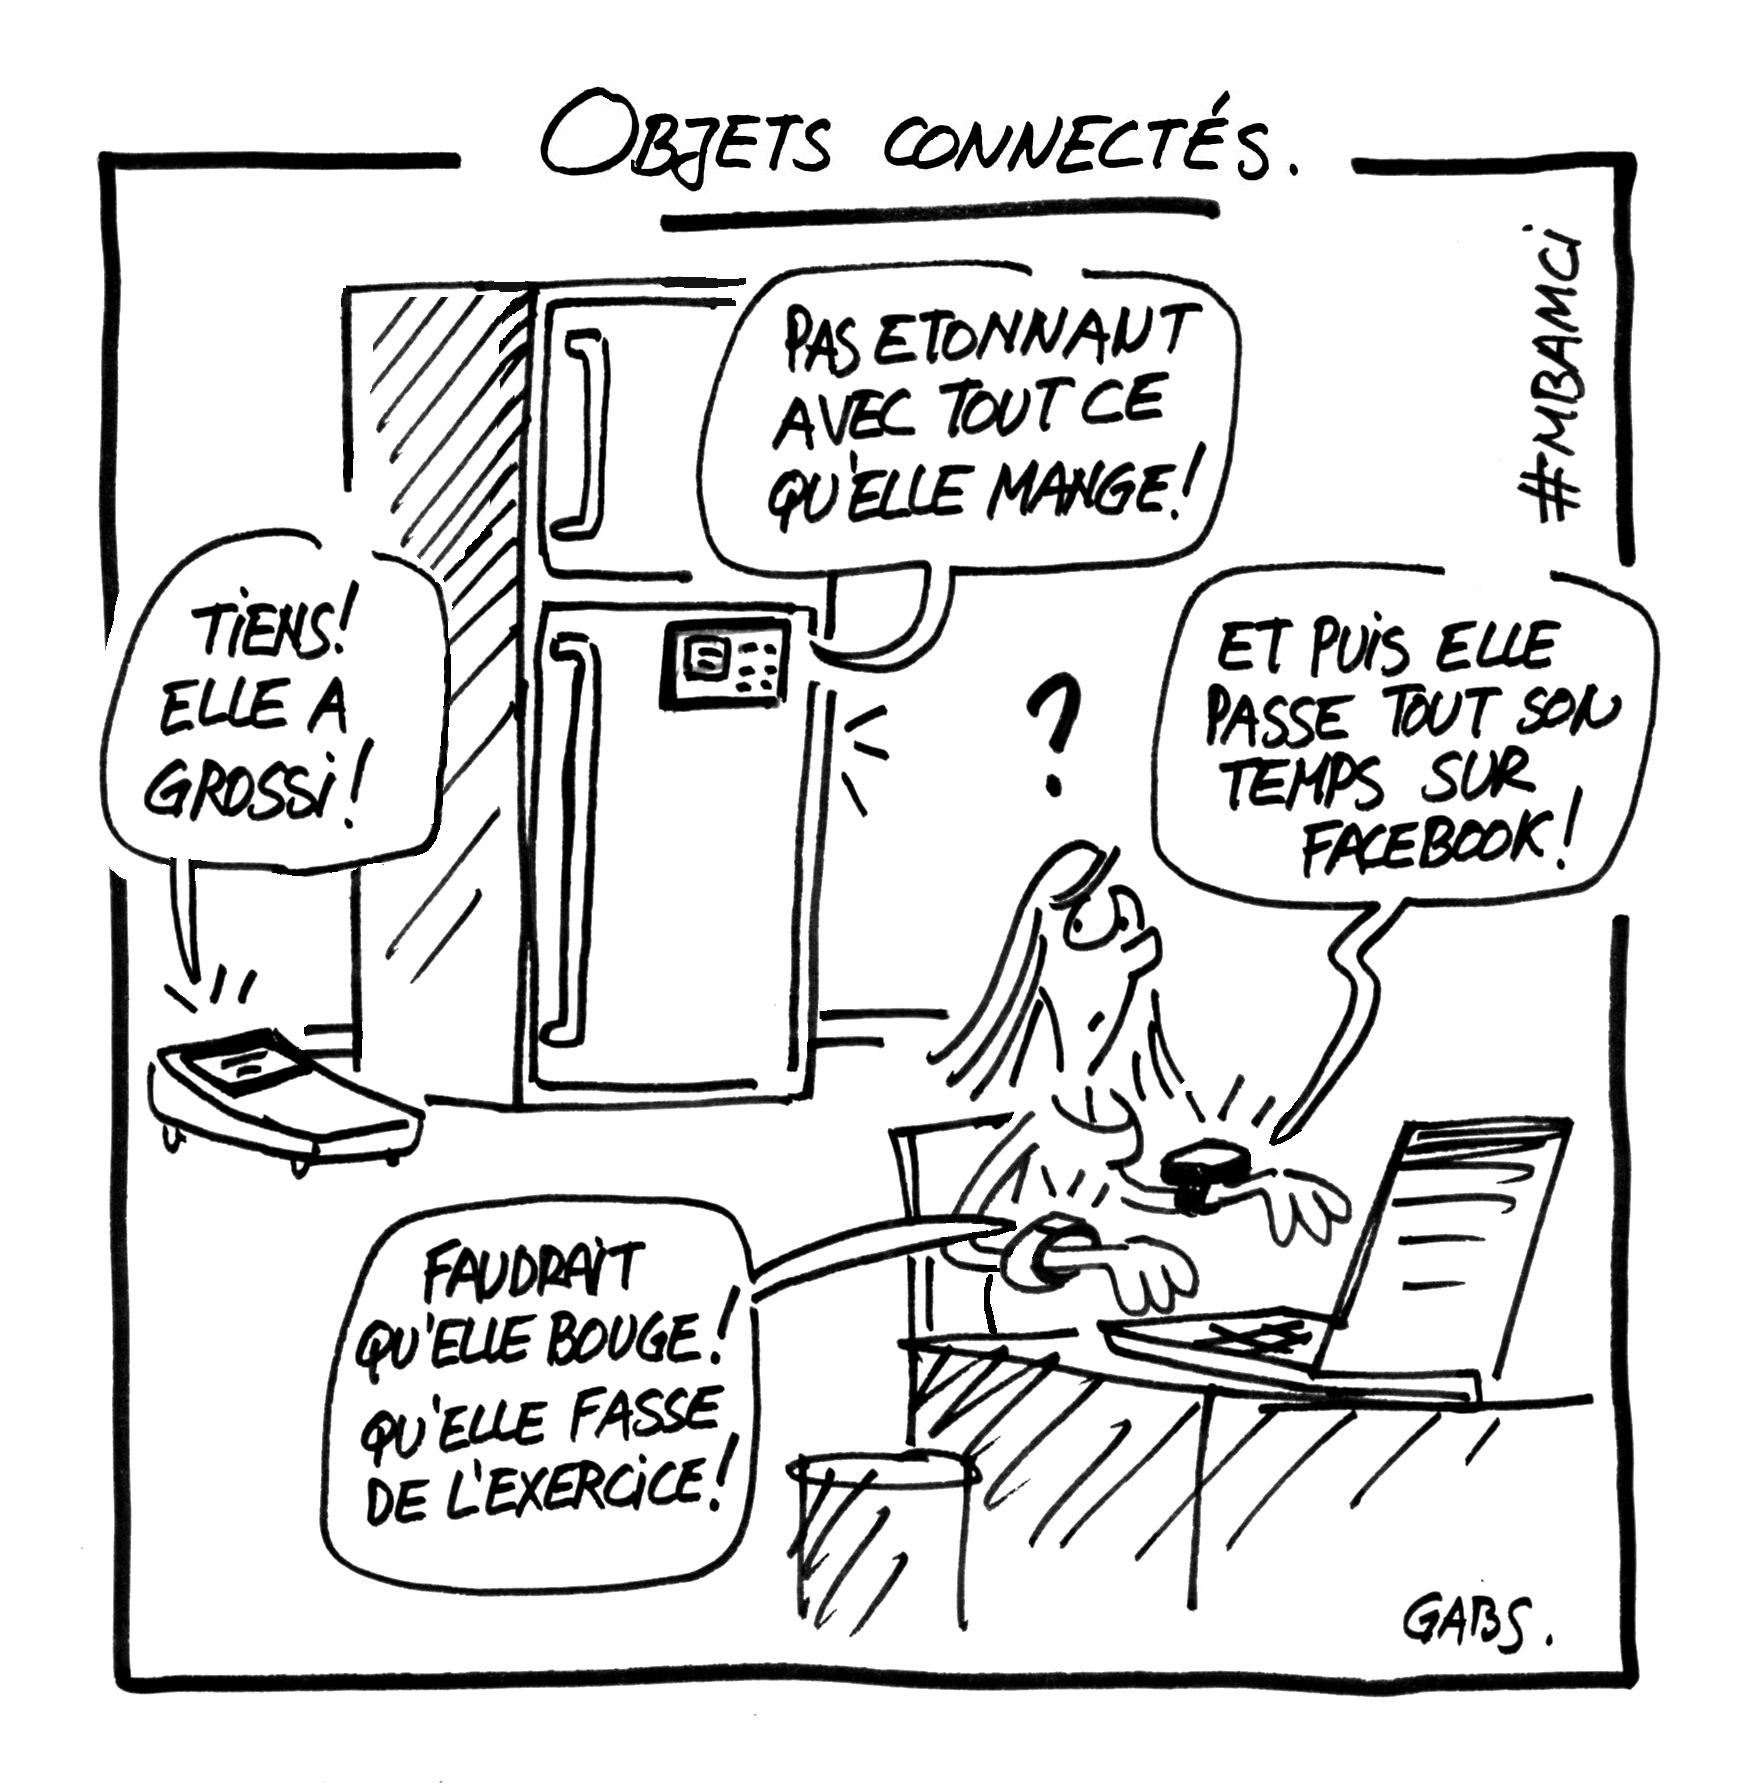 Tendances digitales en 10 dessins humoristiques - Dessin humoristique voiture ...